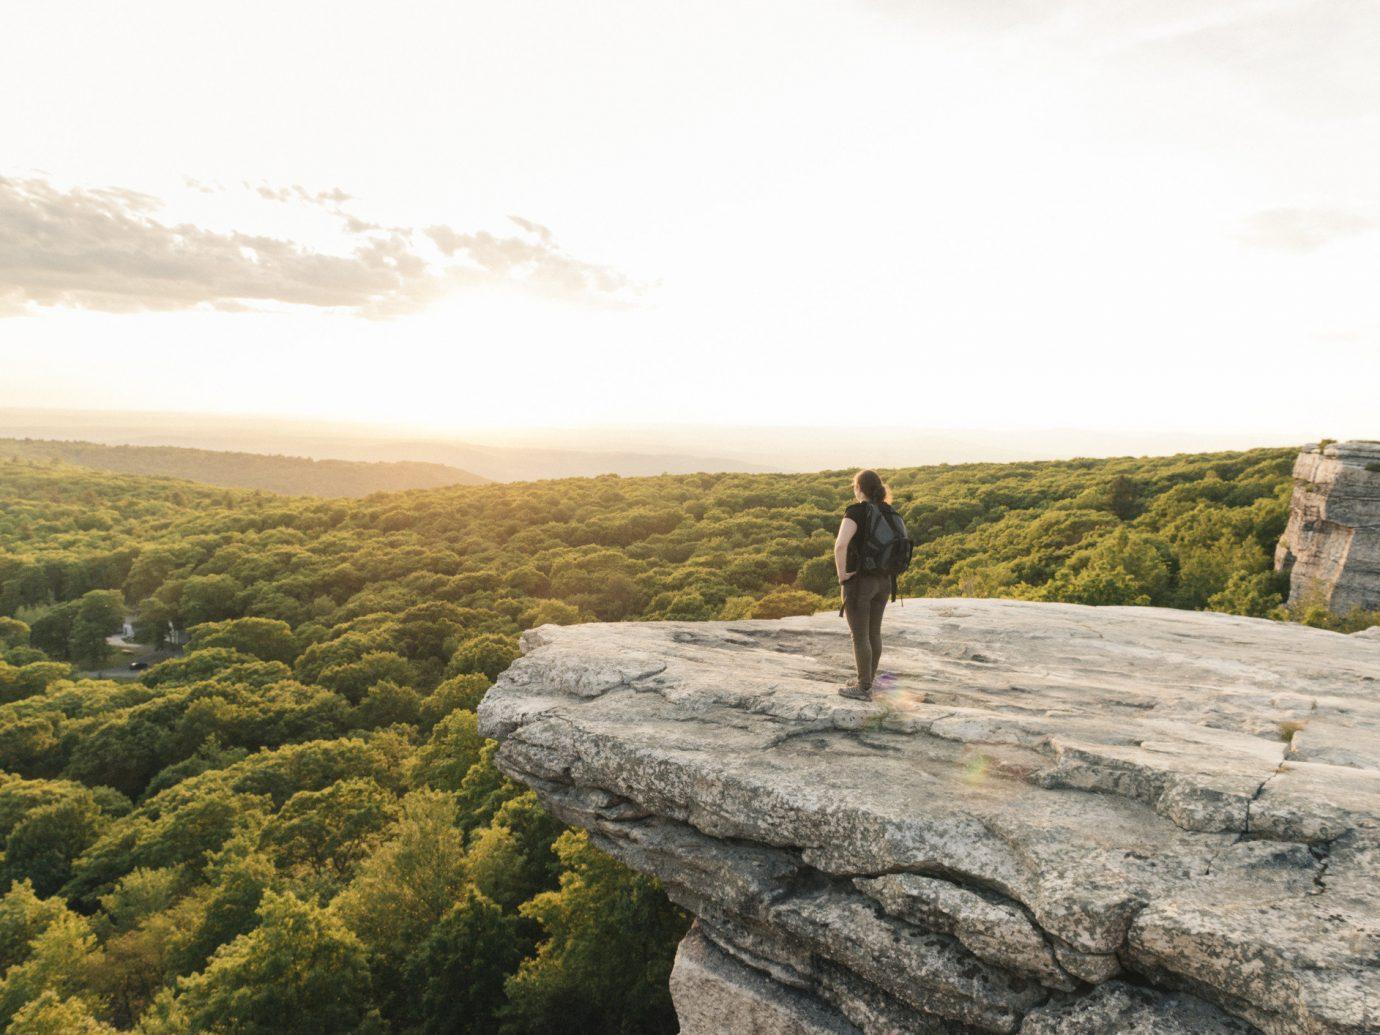 Trip Ideas outdoor sky wilderness Nature horizon rock mountain cliff hill Coast landscape terrain plateau Sea geology ridge valley panorama